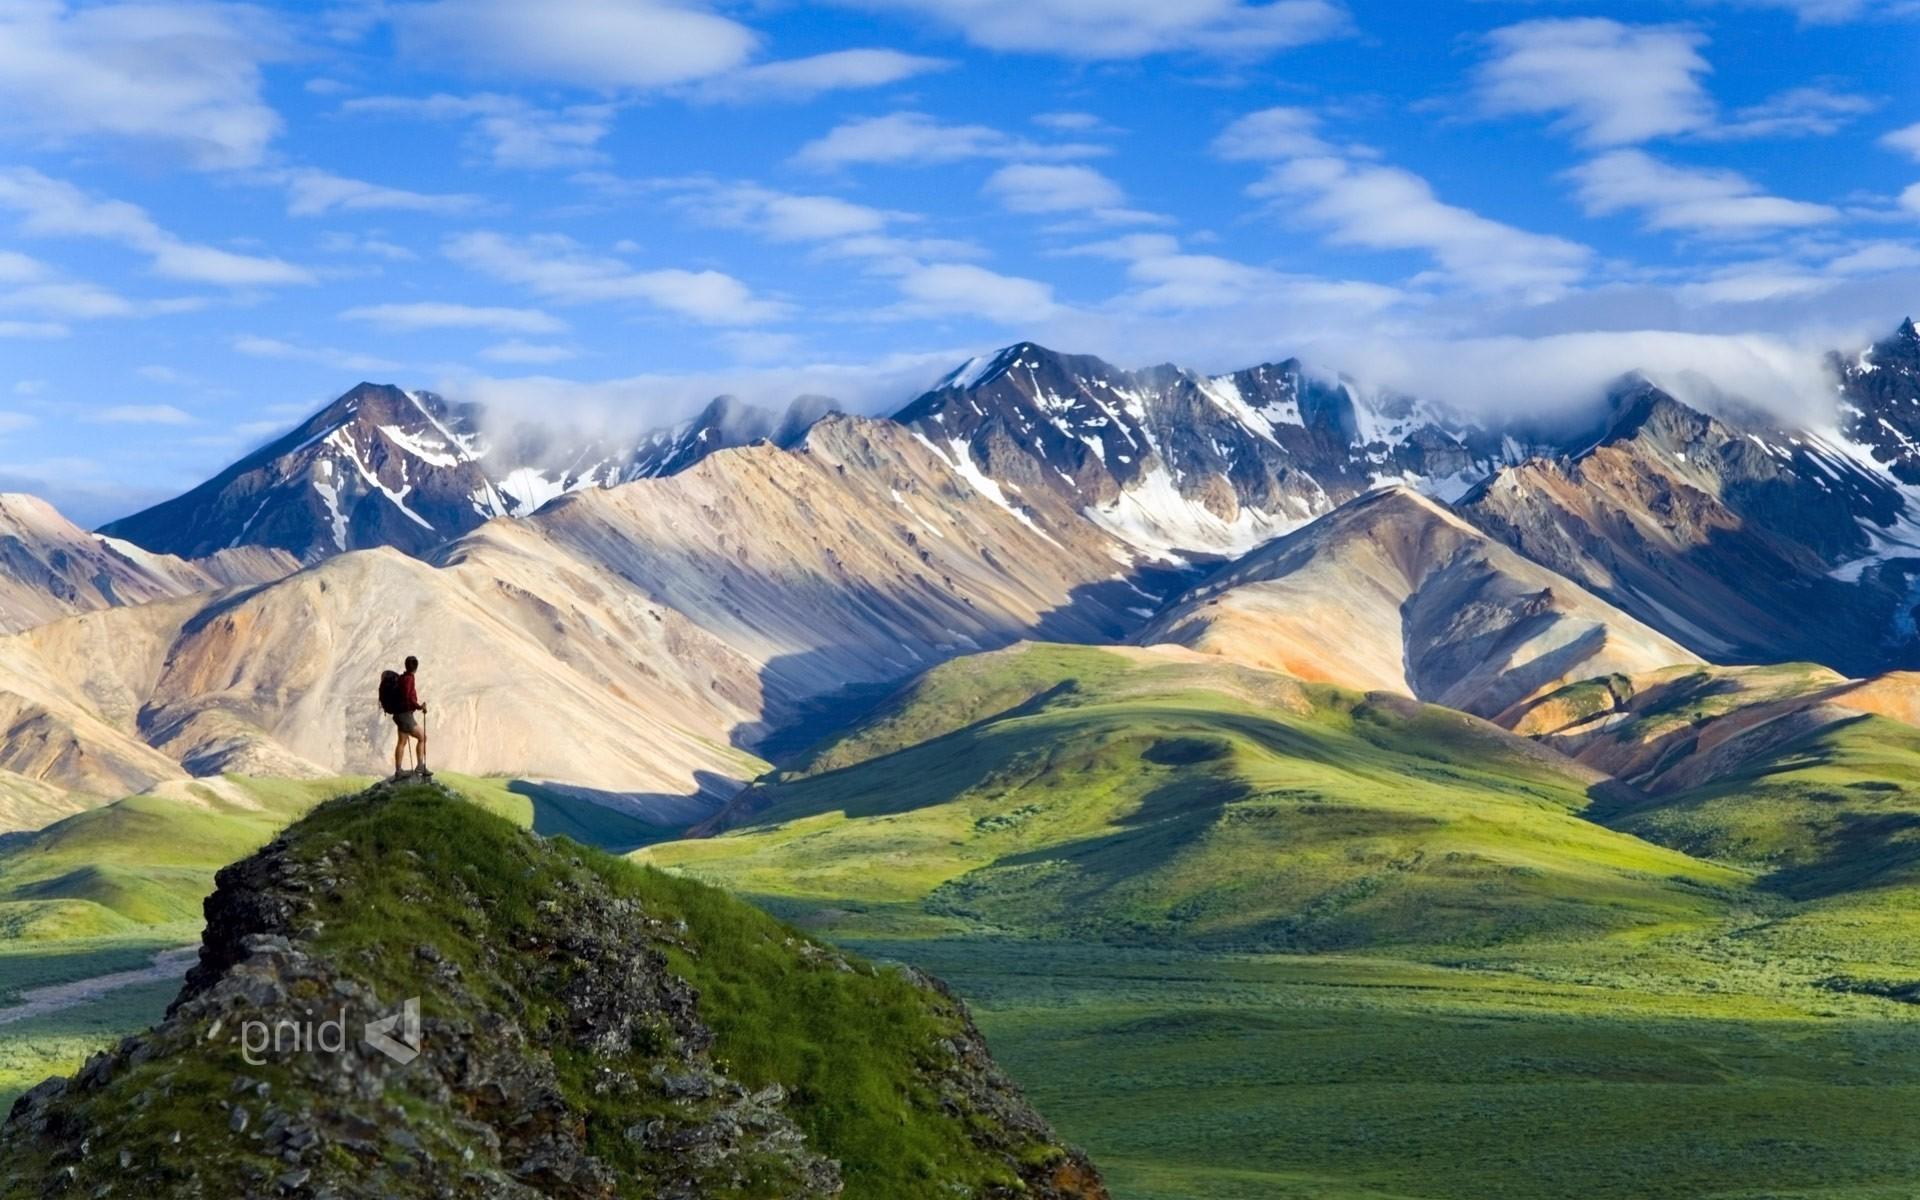 Nature, Landscape, Mountain, Hiking, National Park, - Denali National Park Nature - HD Wallpaper